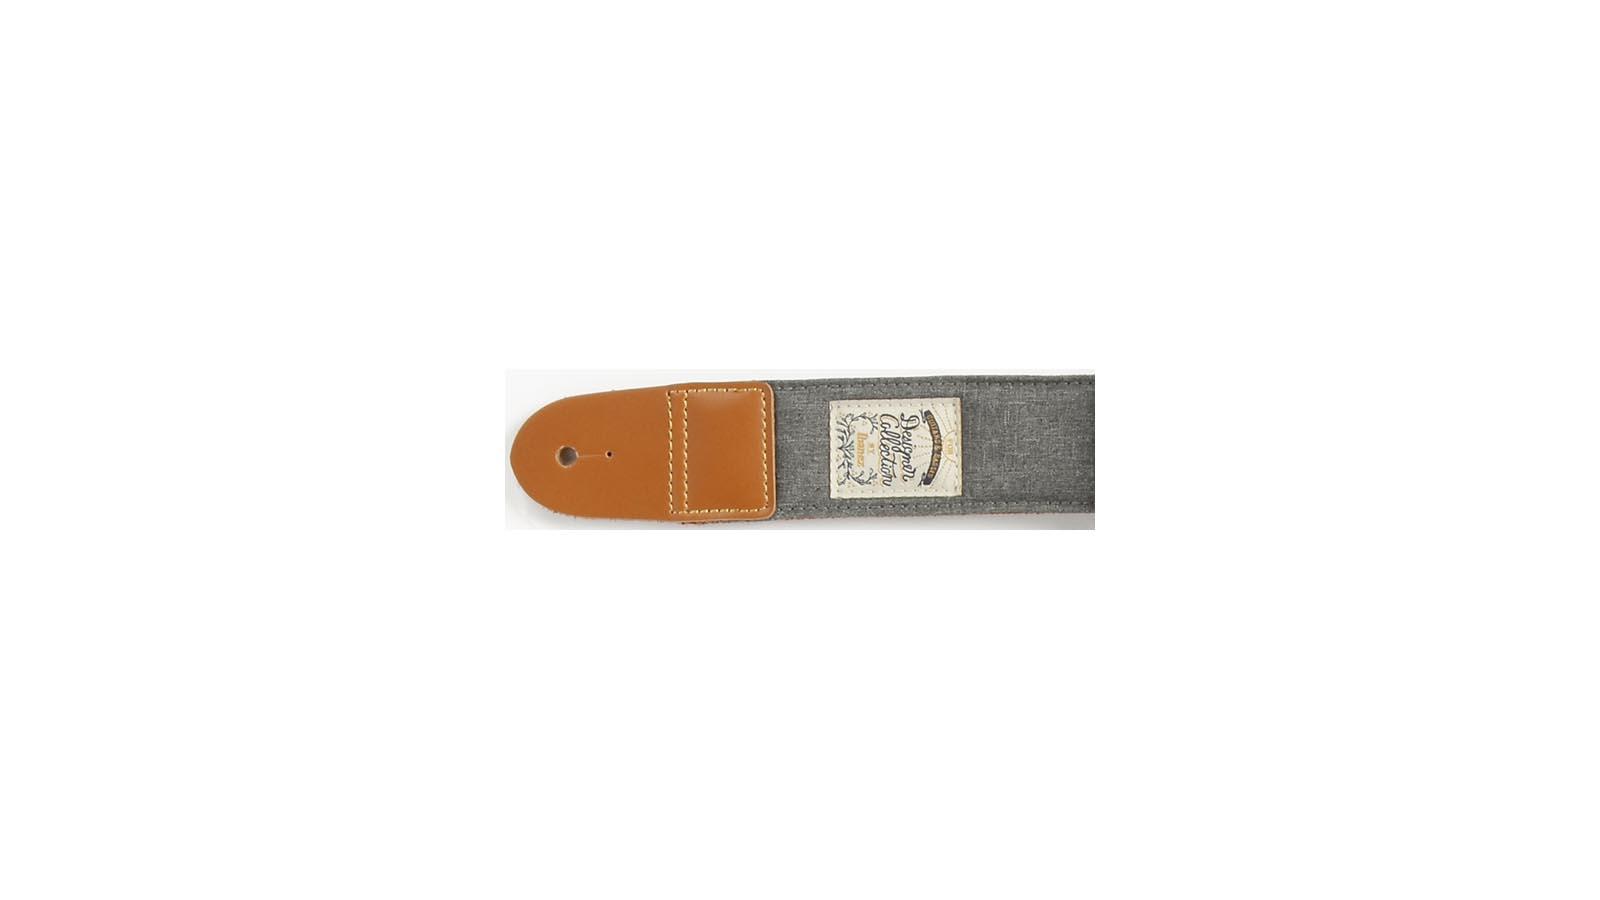 Ibanez DCS50D-CGY Designer Gurt Charcoal Gray